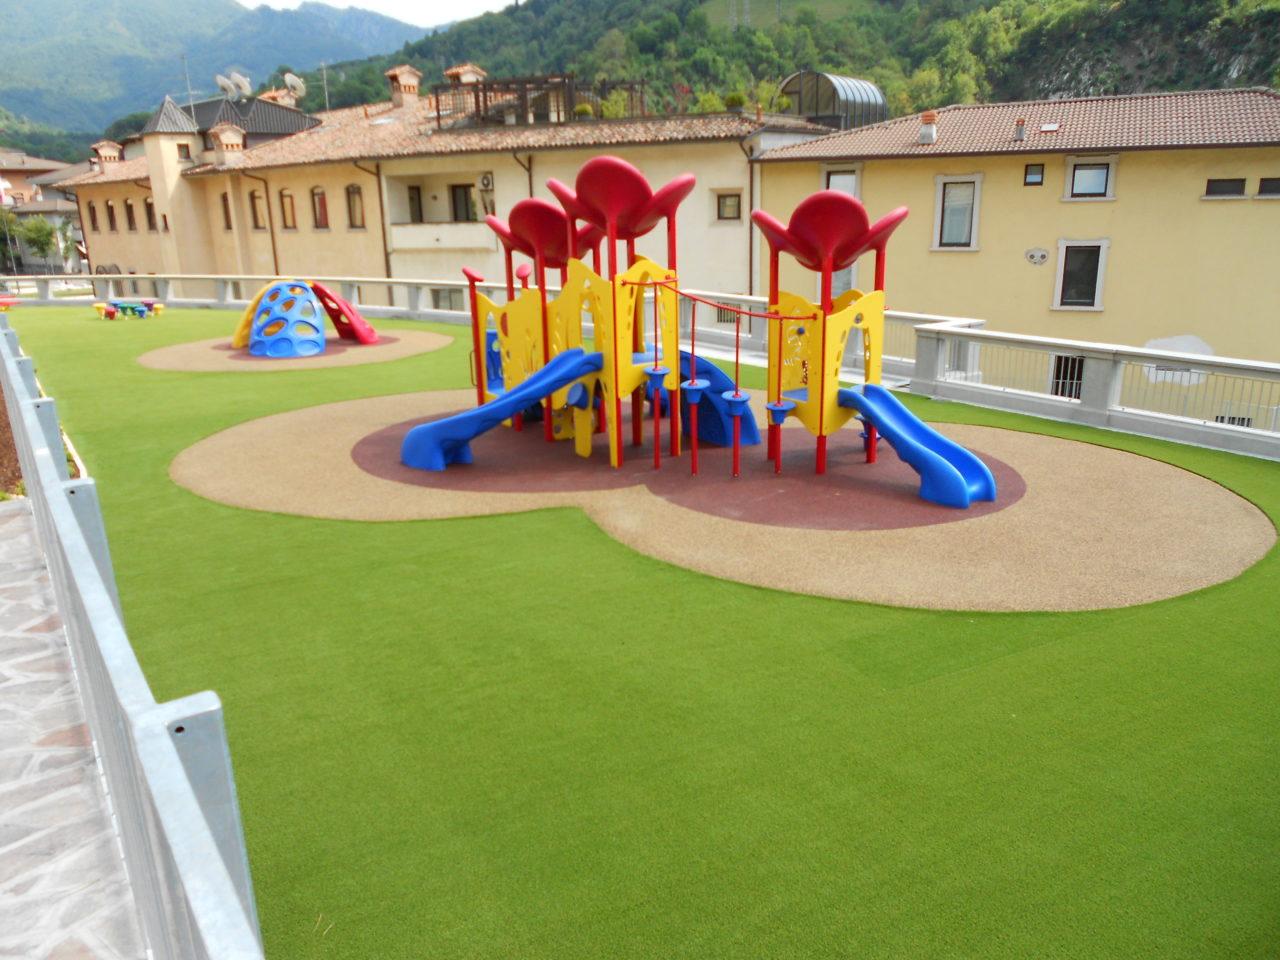 parco-giochi-in-erba-sintetica